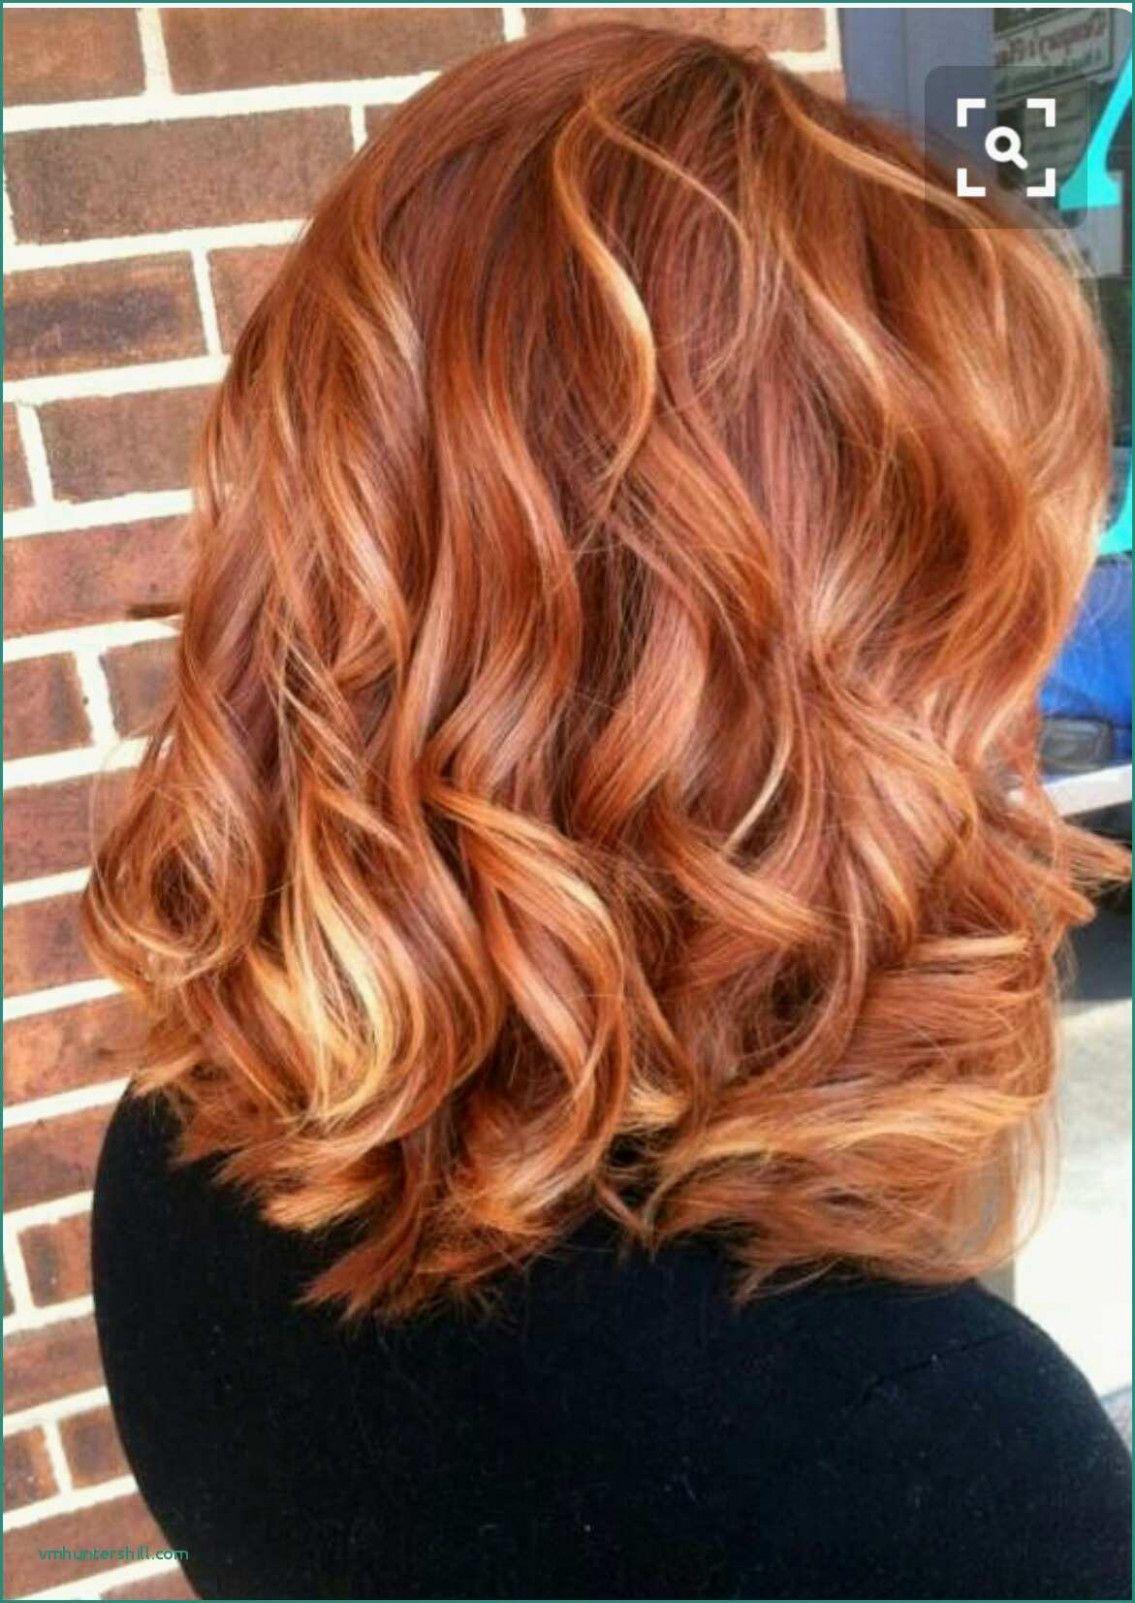 Orange Hair Tumblr Pretty Girls Hairstyles Tumblr Hairstyles Girls